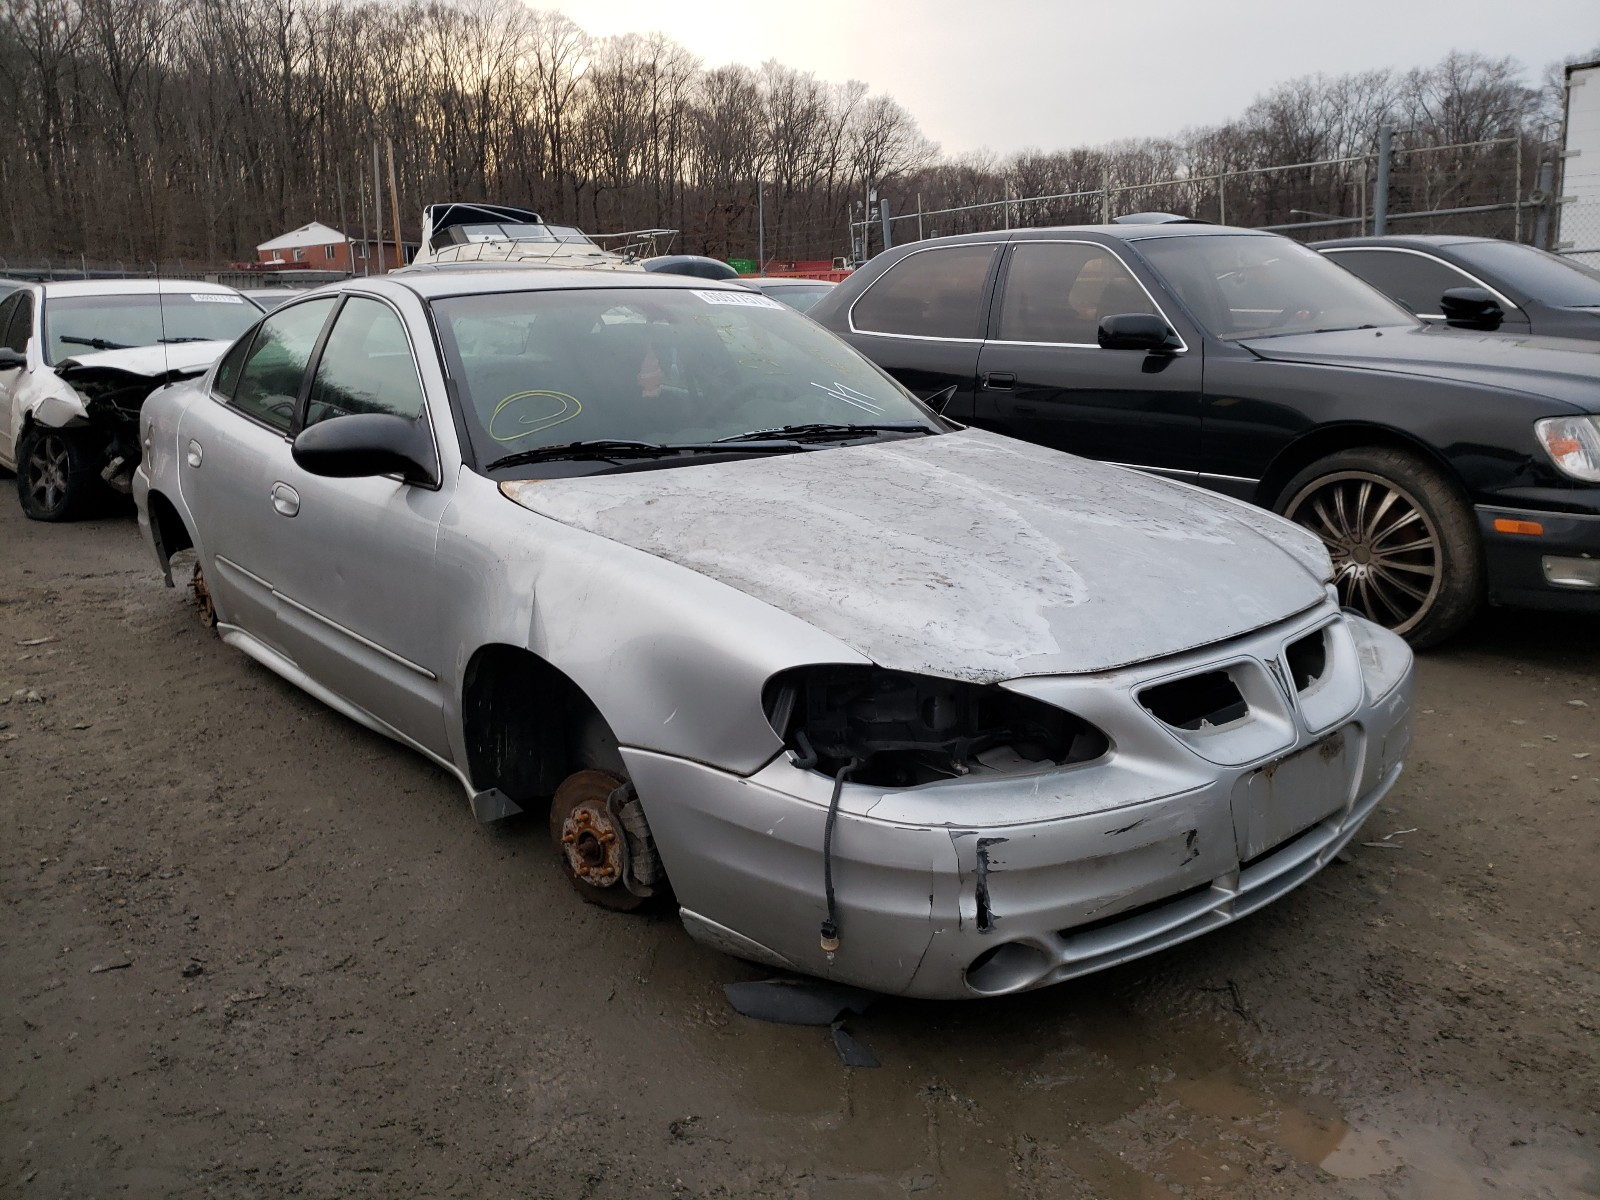 2003 Pontiac Grand Am S For Sale At Copart Finksburg Md Lot 60977570 Salvagereseller Com